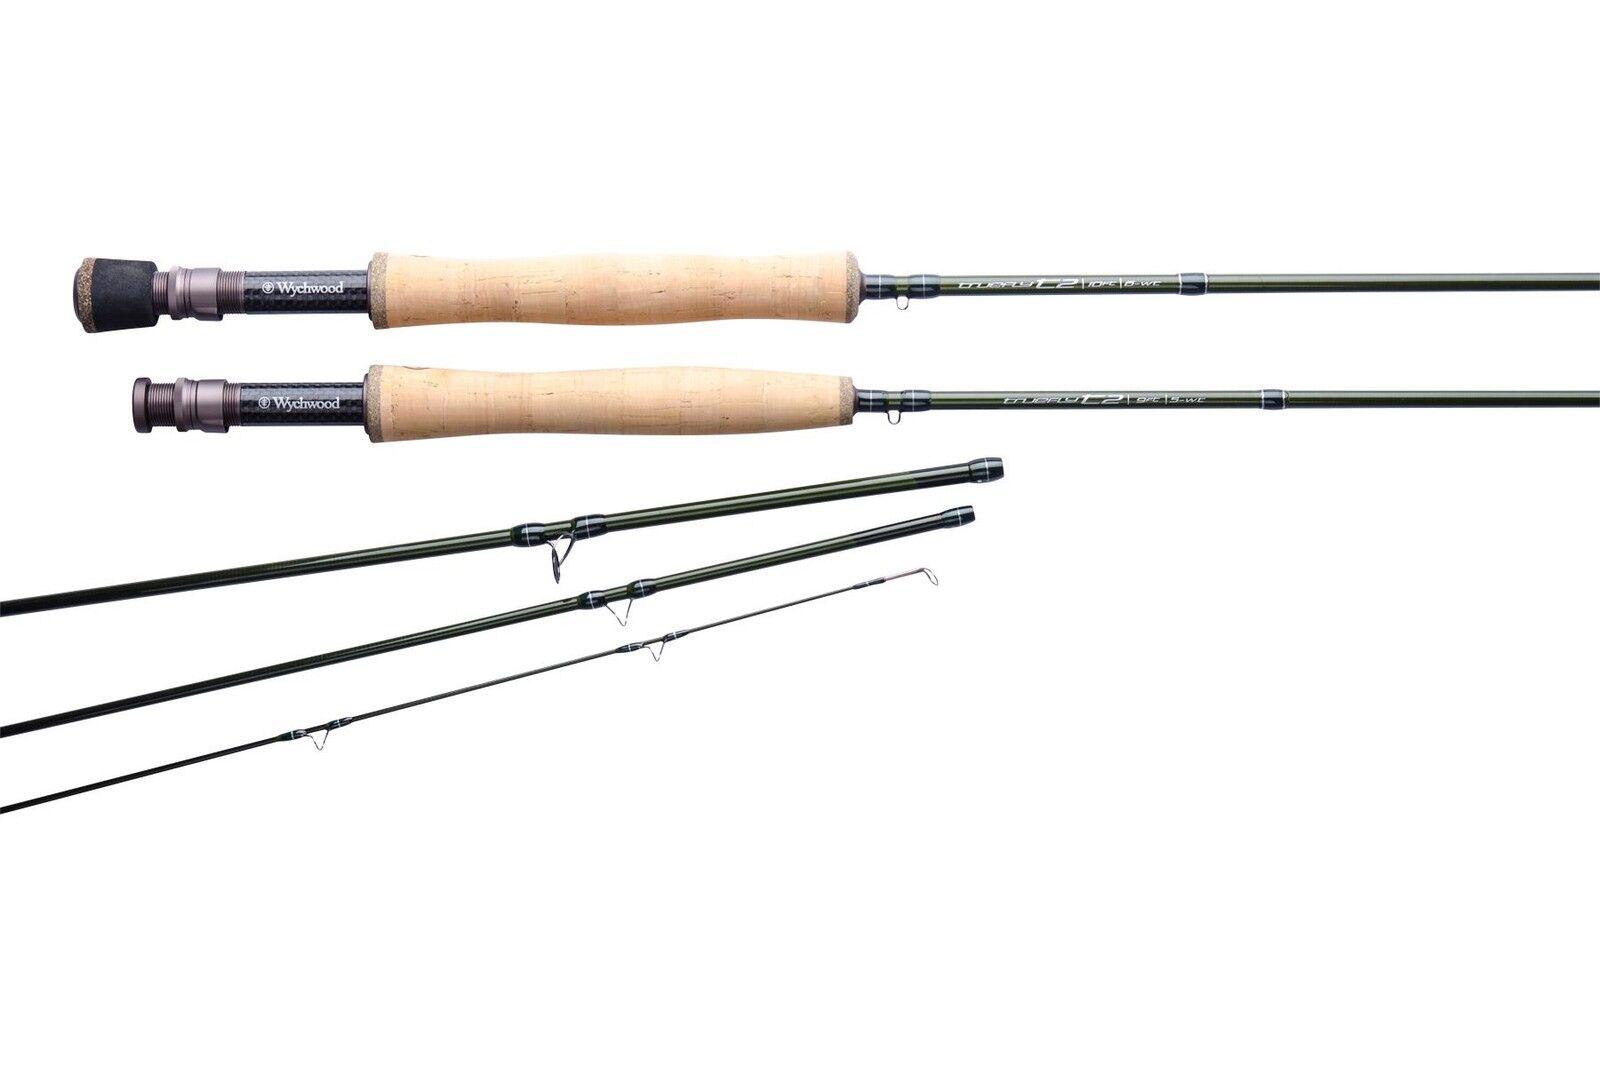 Wychwood Truefly T2 9ft   Leeda   Fly Fishing